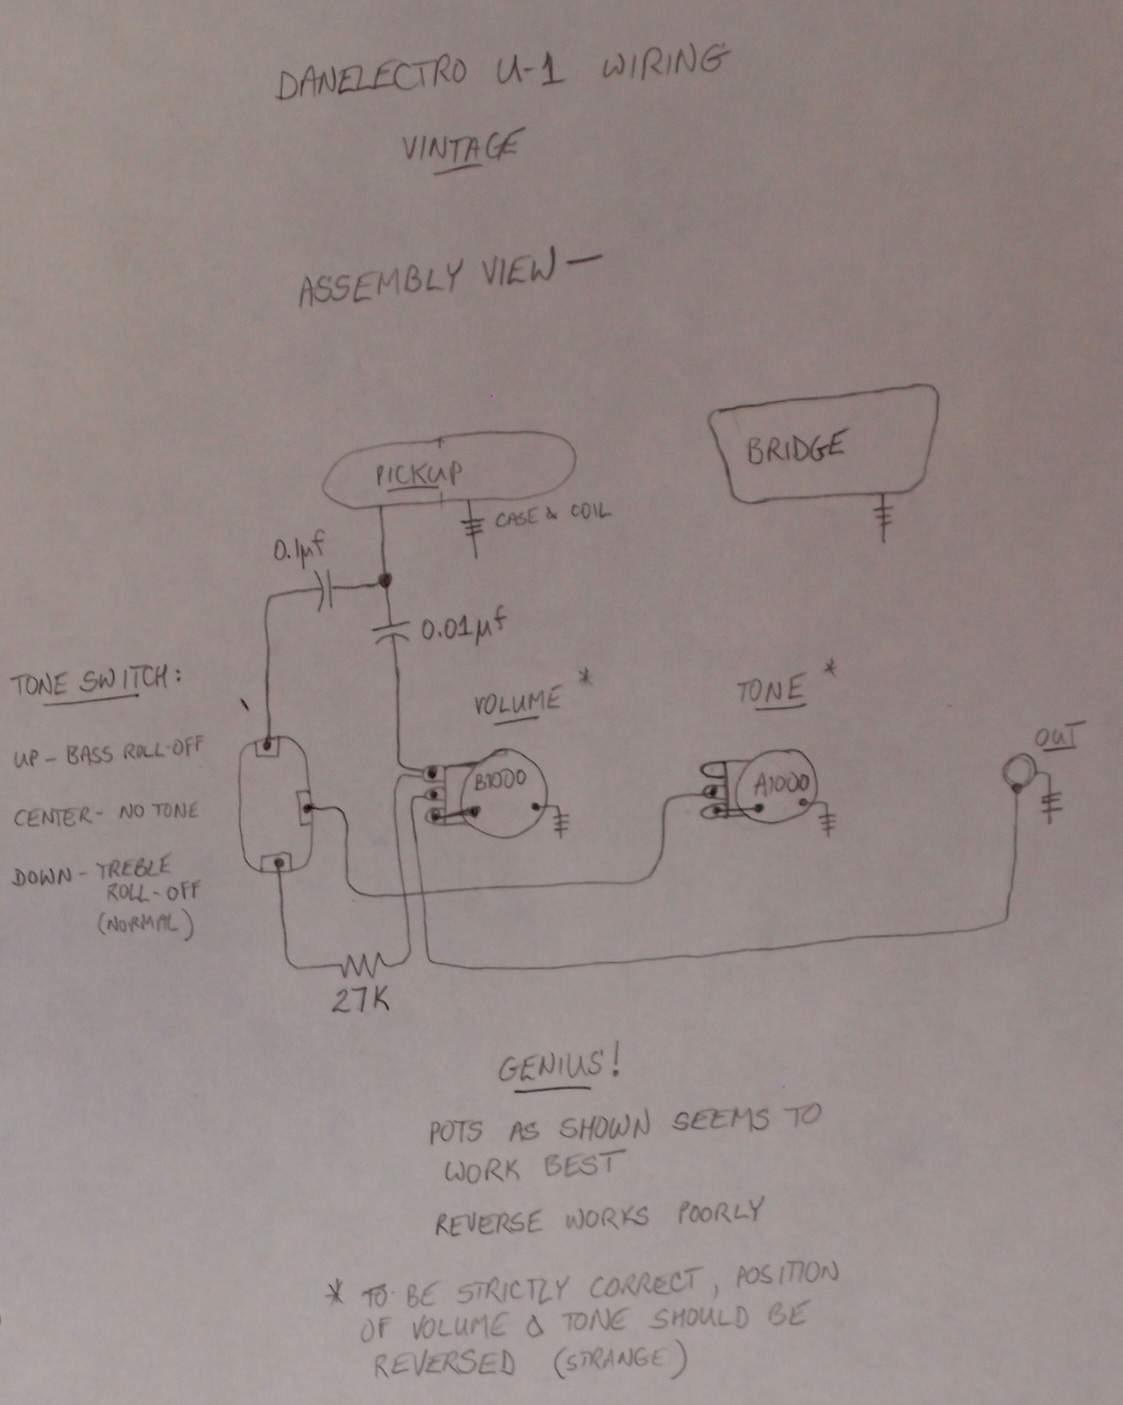 single pickup guitar wiring diagram 2005 scion xb belt danelectro fab schematic get free image about